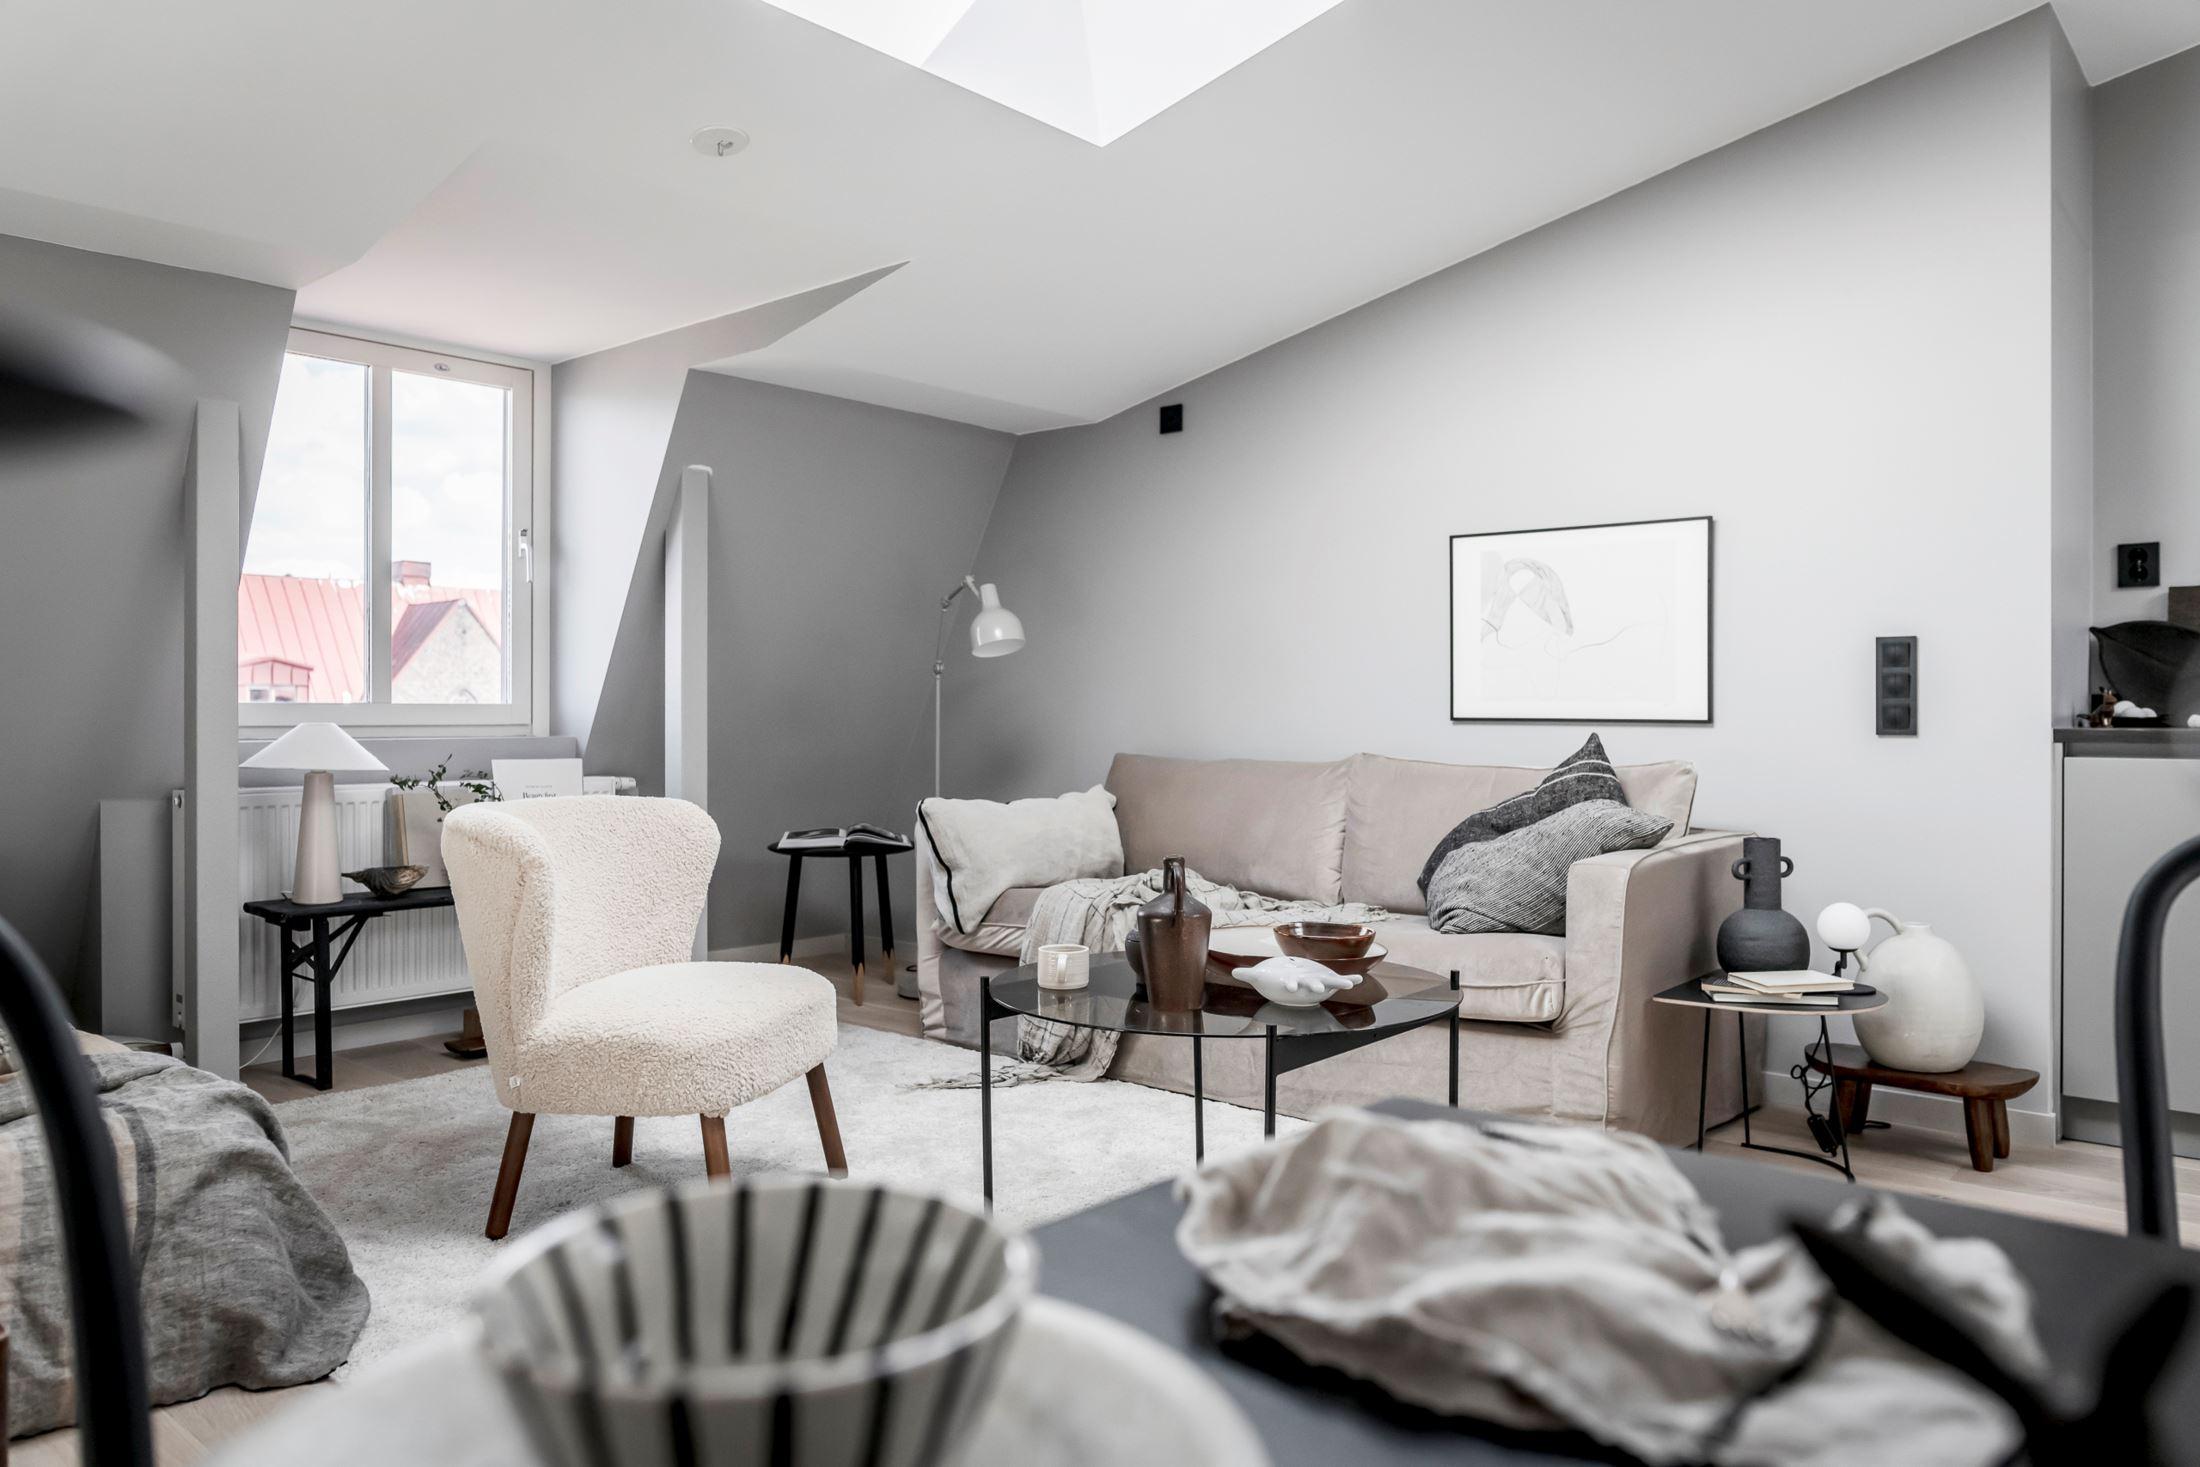 Plan deschis și decor nordic într o garsonieră la mansardă 35 m² 13